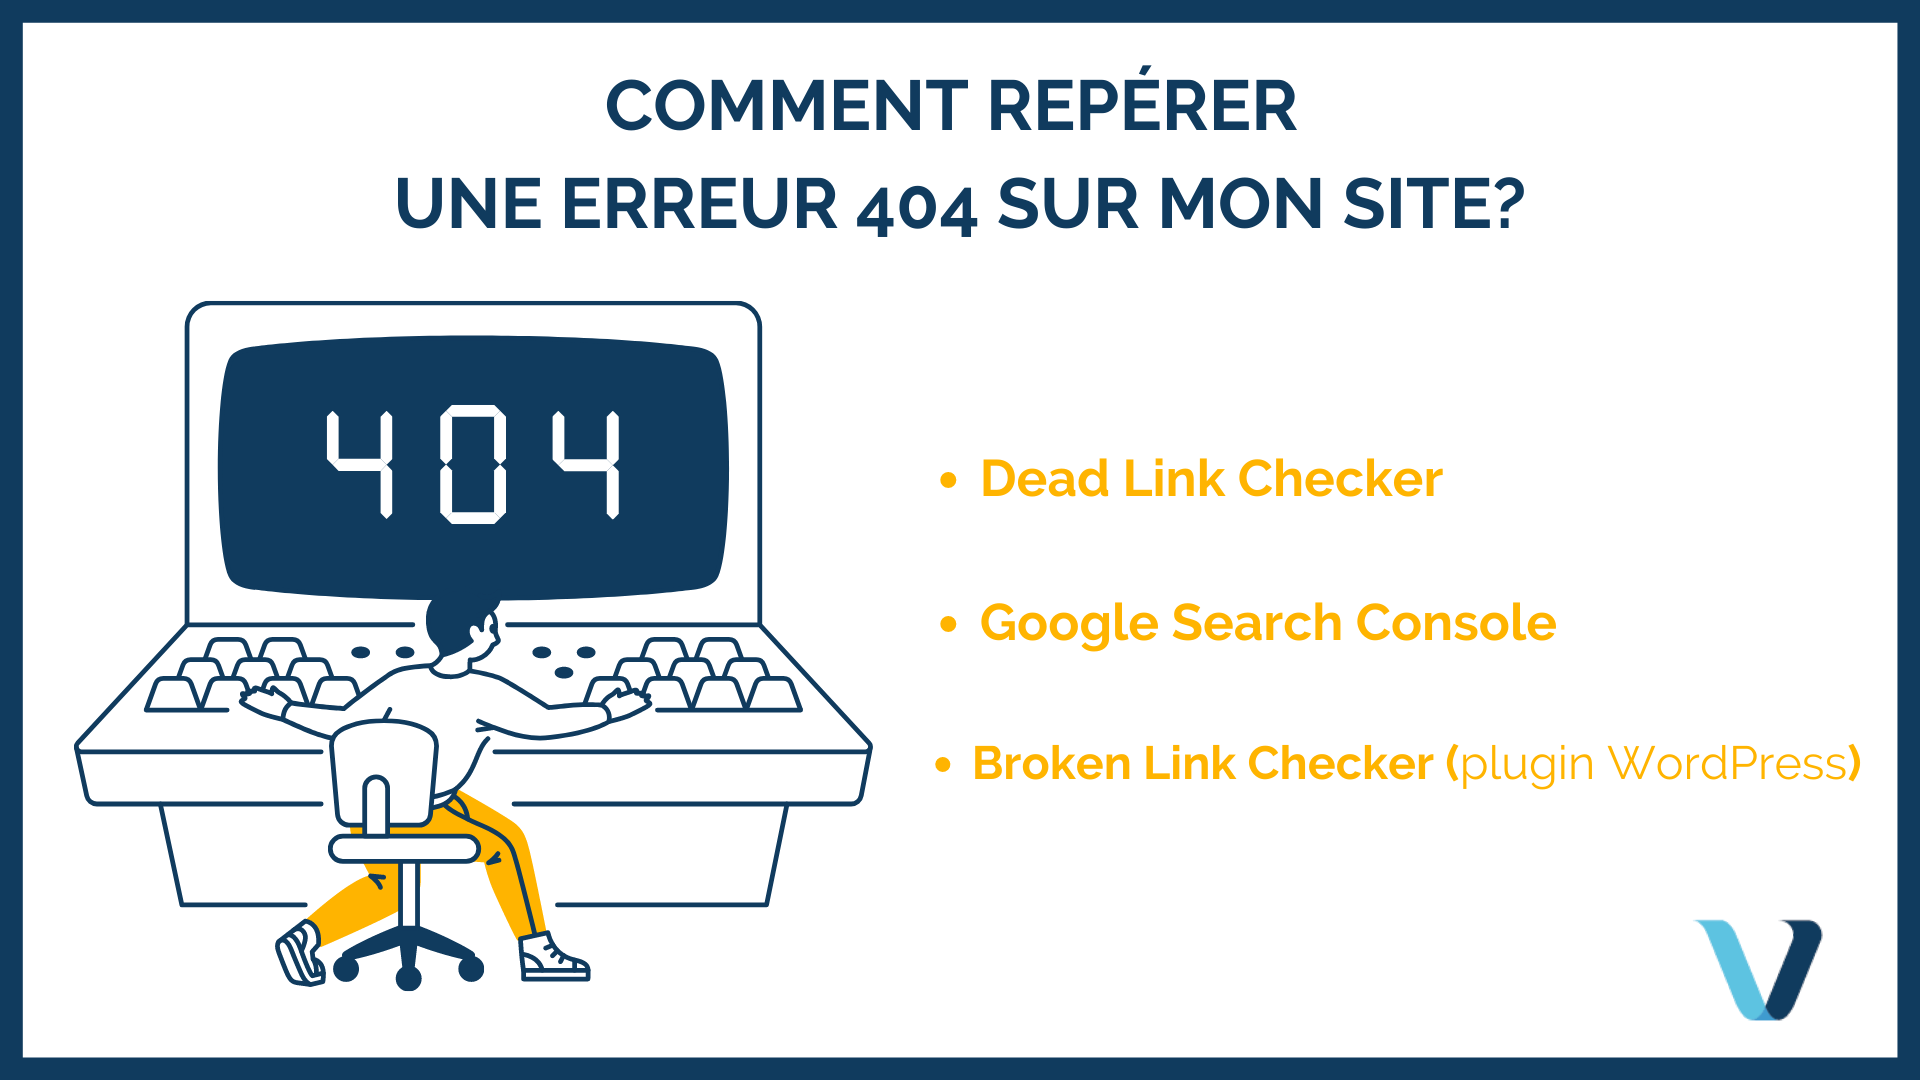 Nos meilleurs conseils pour repérer les erreurs 404